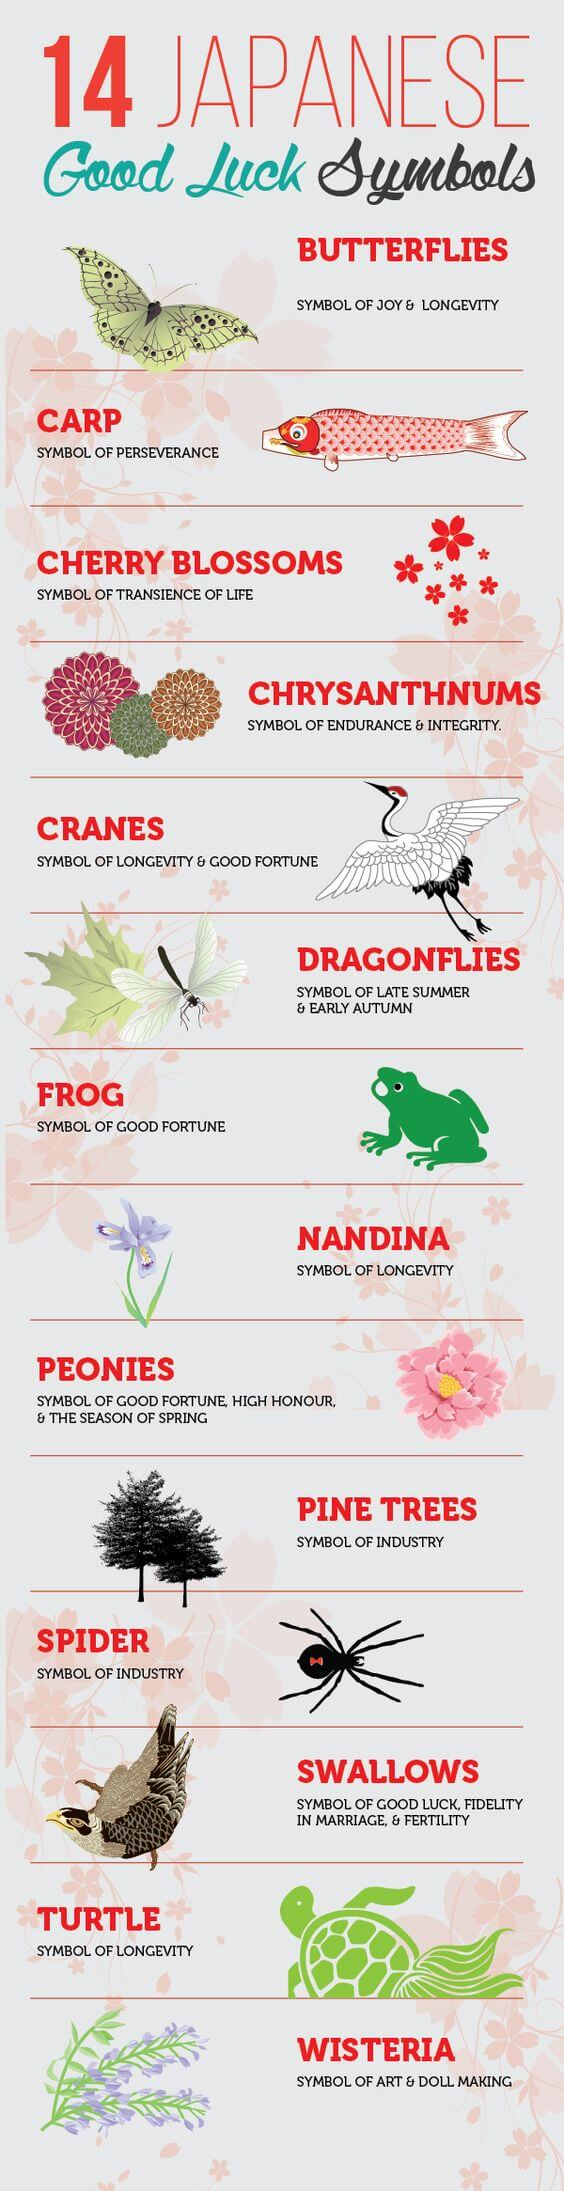 simbolos japoneses para tatuajes significados